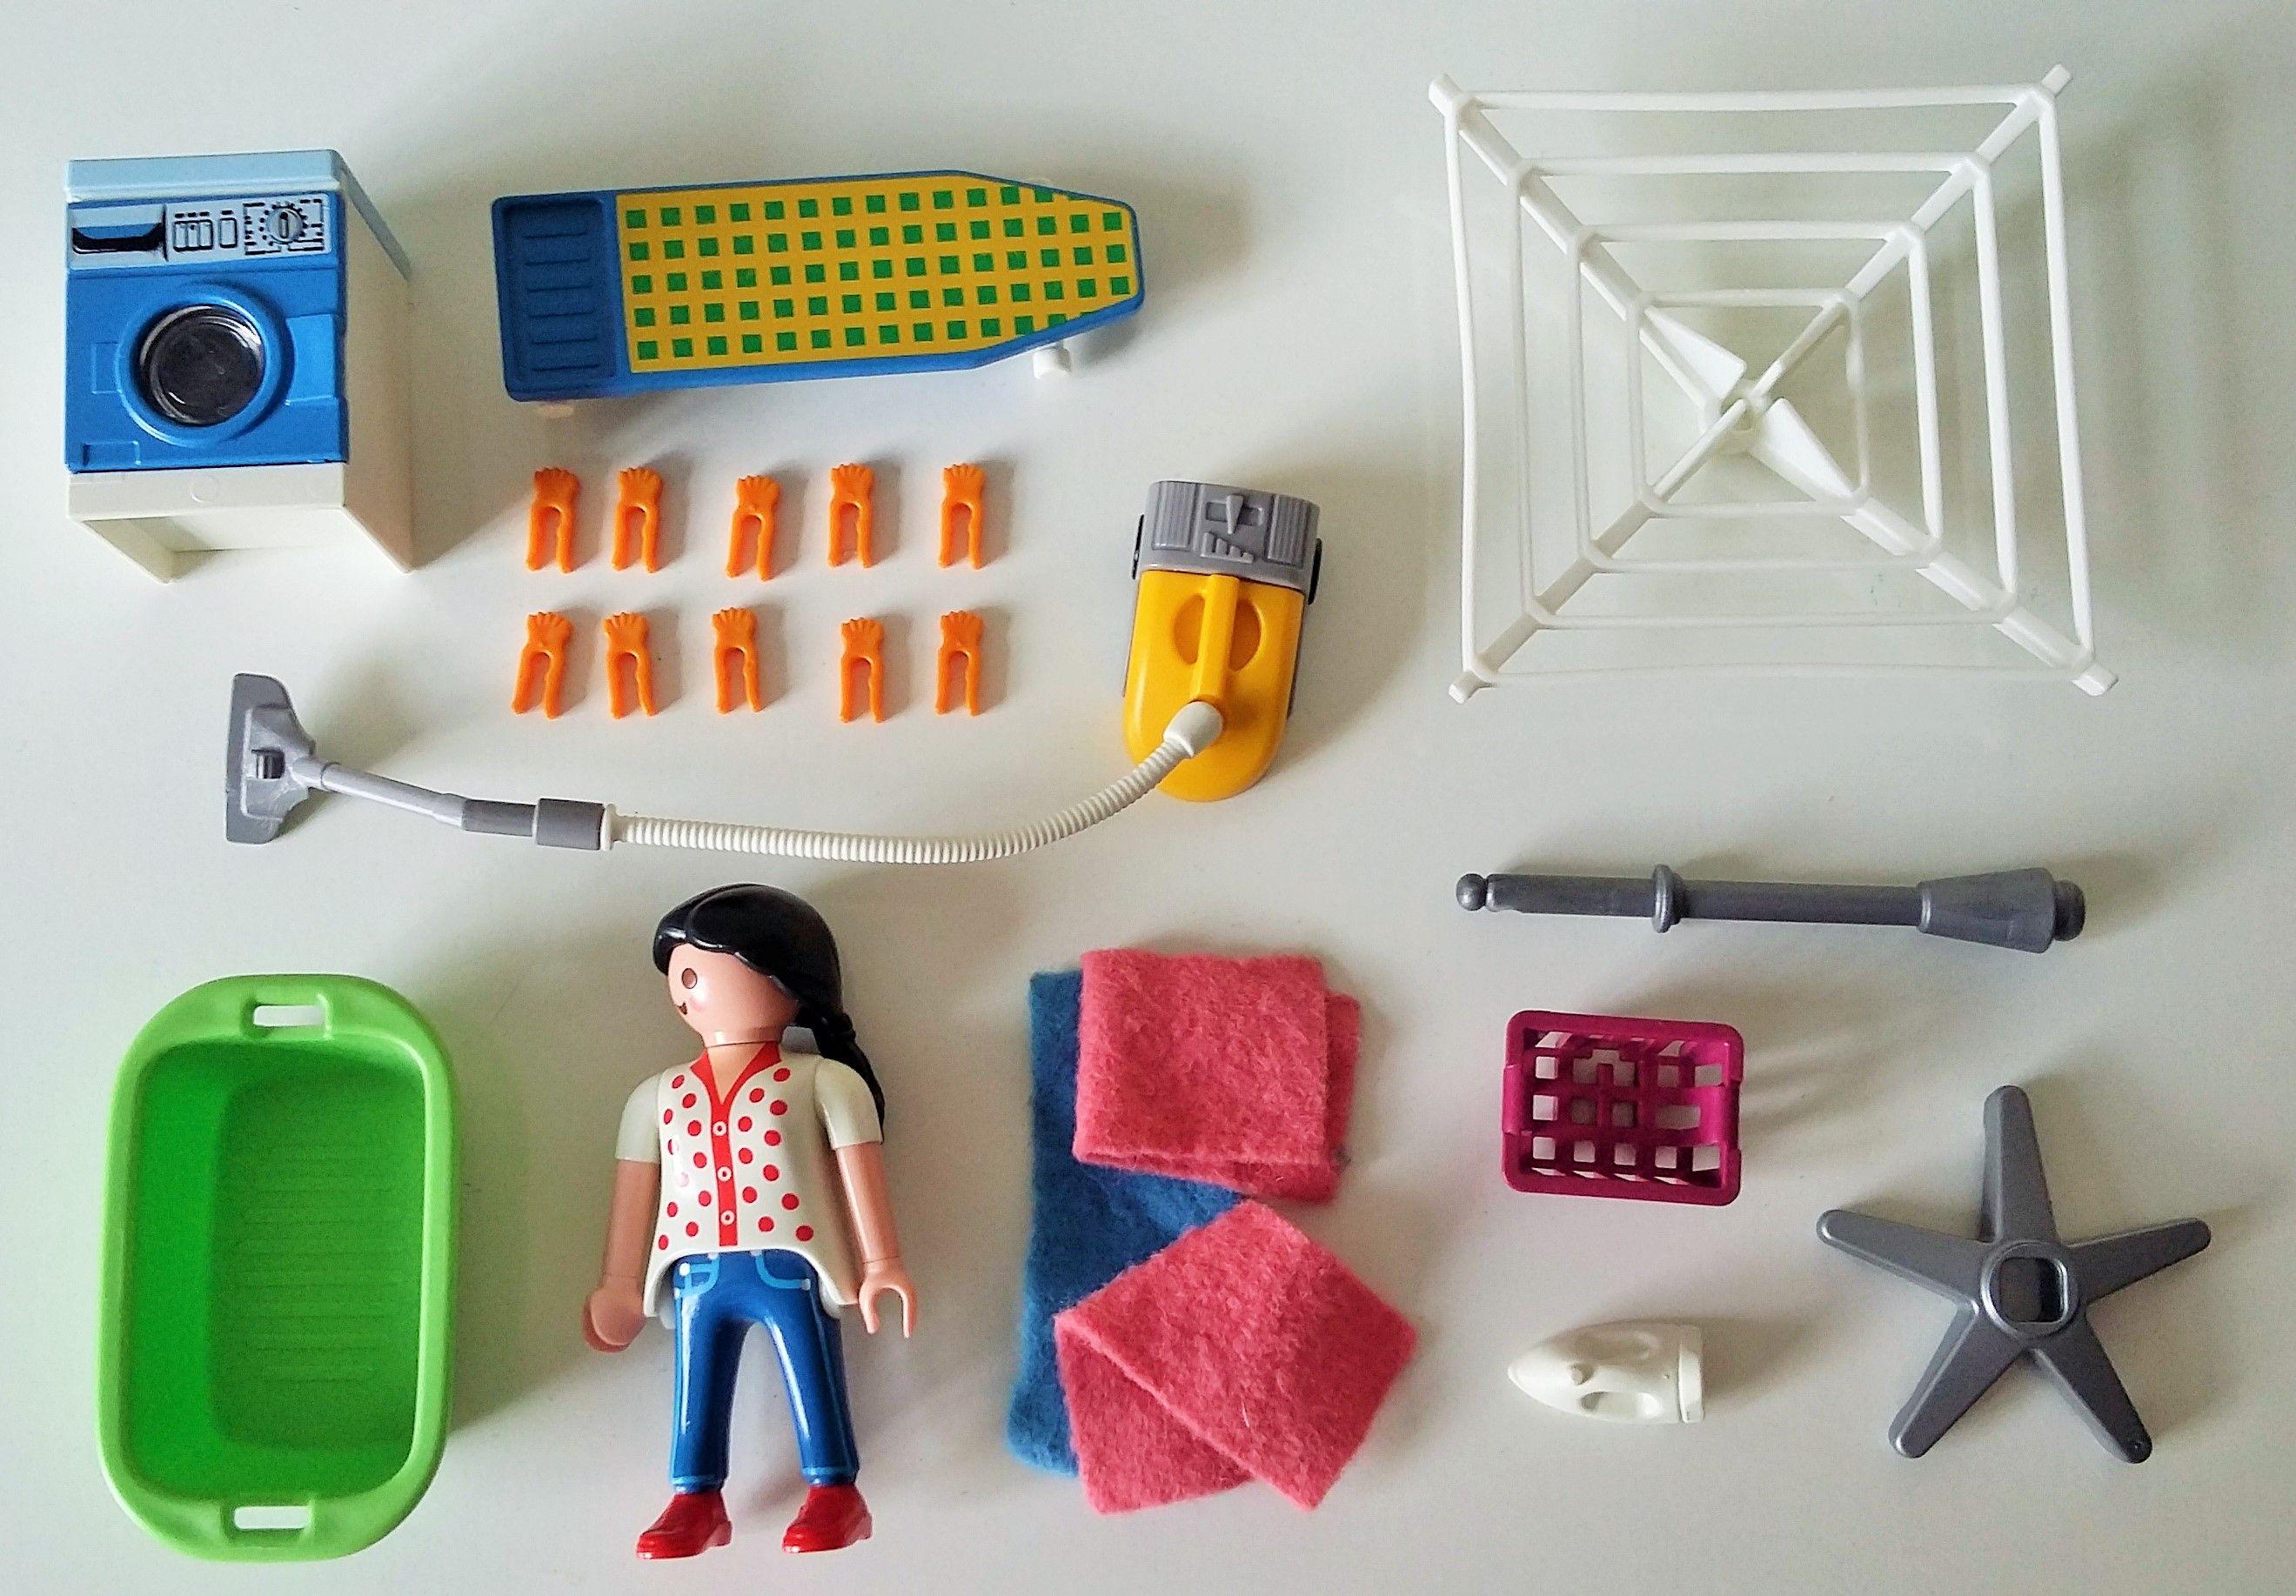 Playmobil Dollhouse Slaapkamer : Playmobil city laundry set housekeeping room playmobil